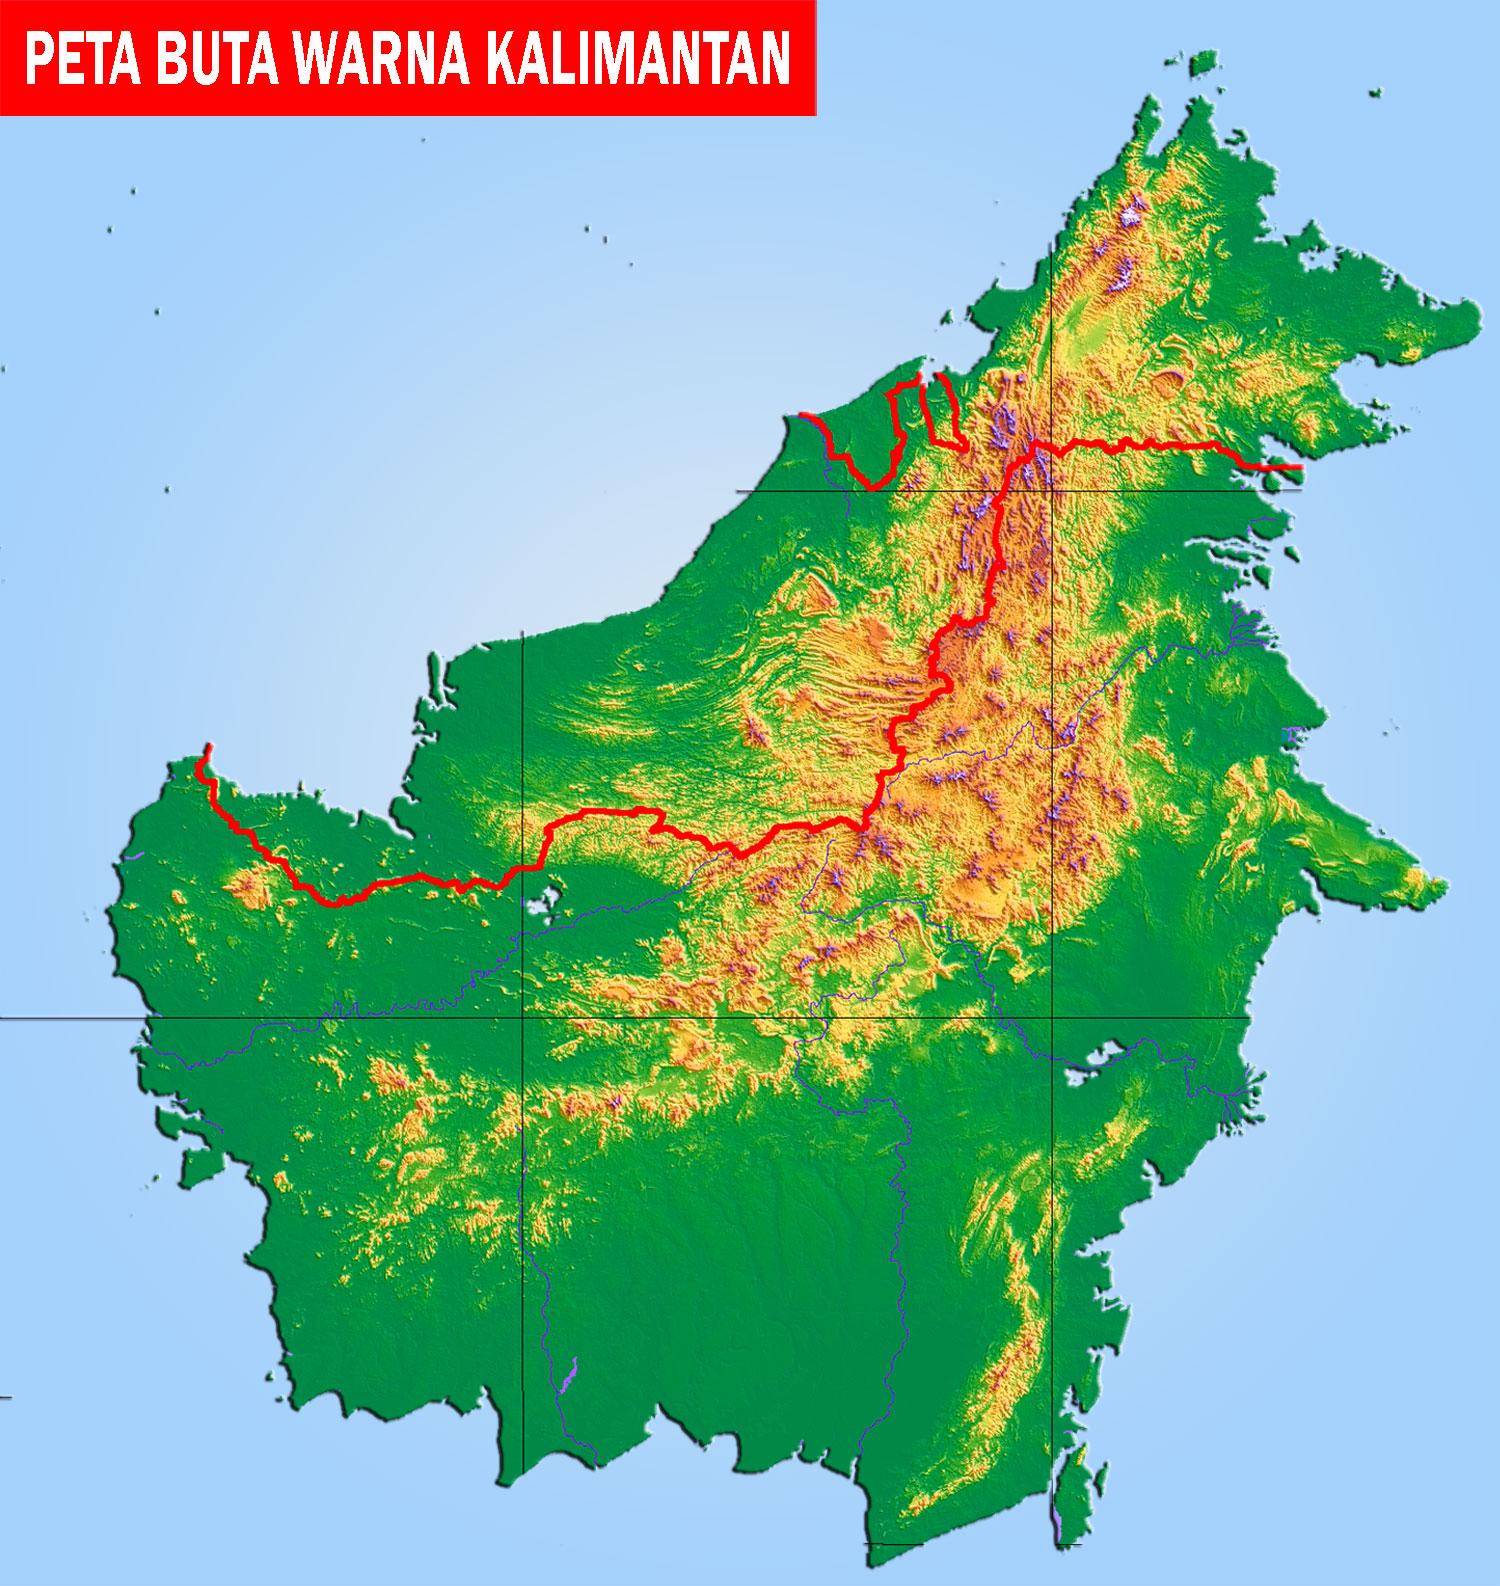 Peta Kalimantan Lengkap 5 Provinsi Sejarah Negara Gambar Buta Berwarna